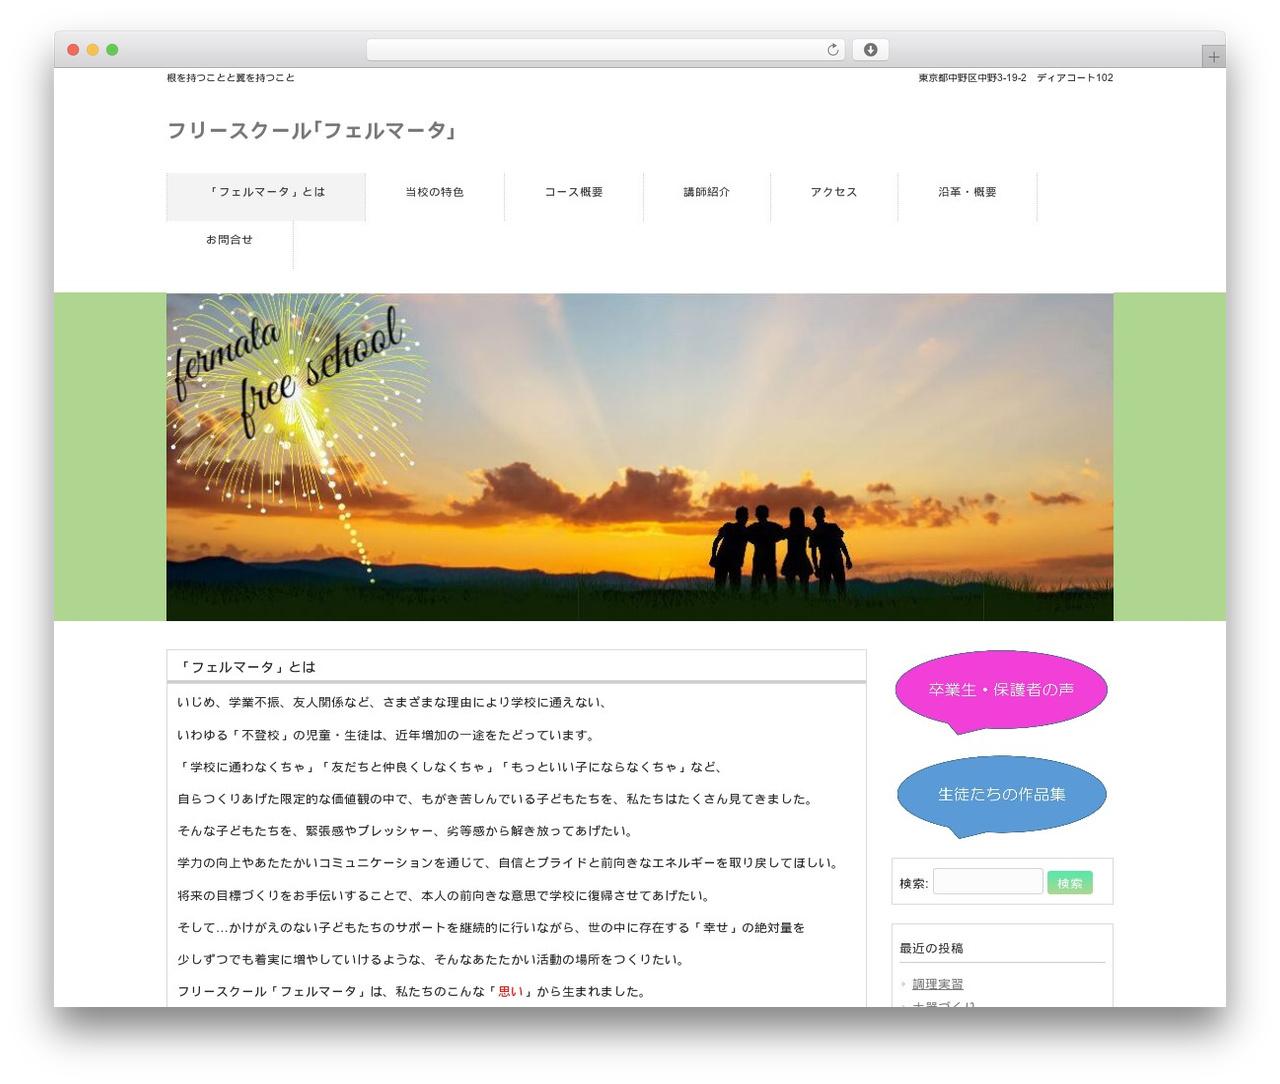 responsive_135 WP theme - free-school-fermata.com